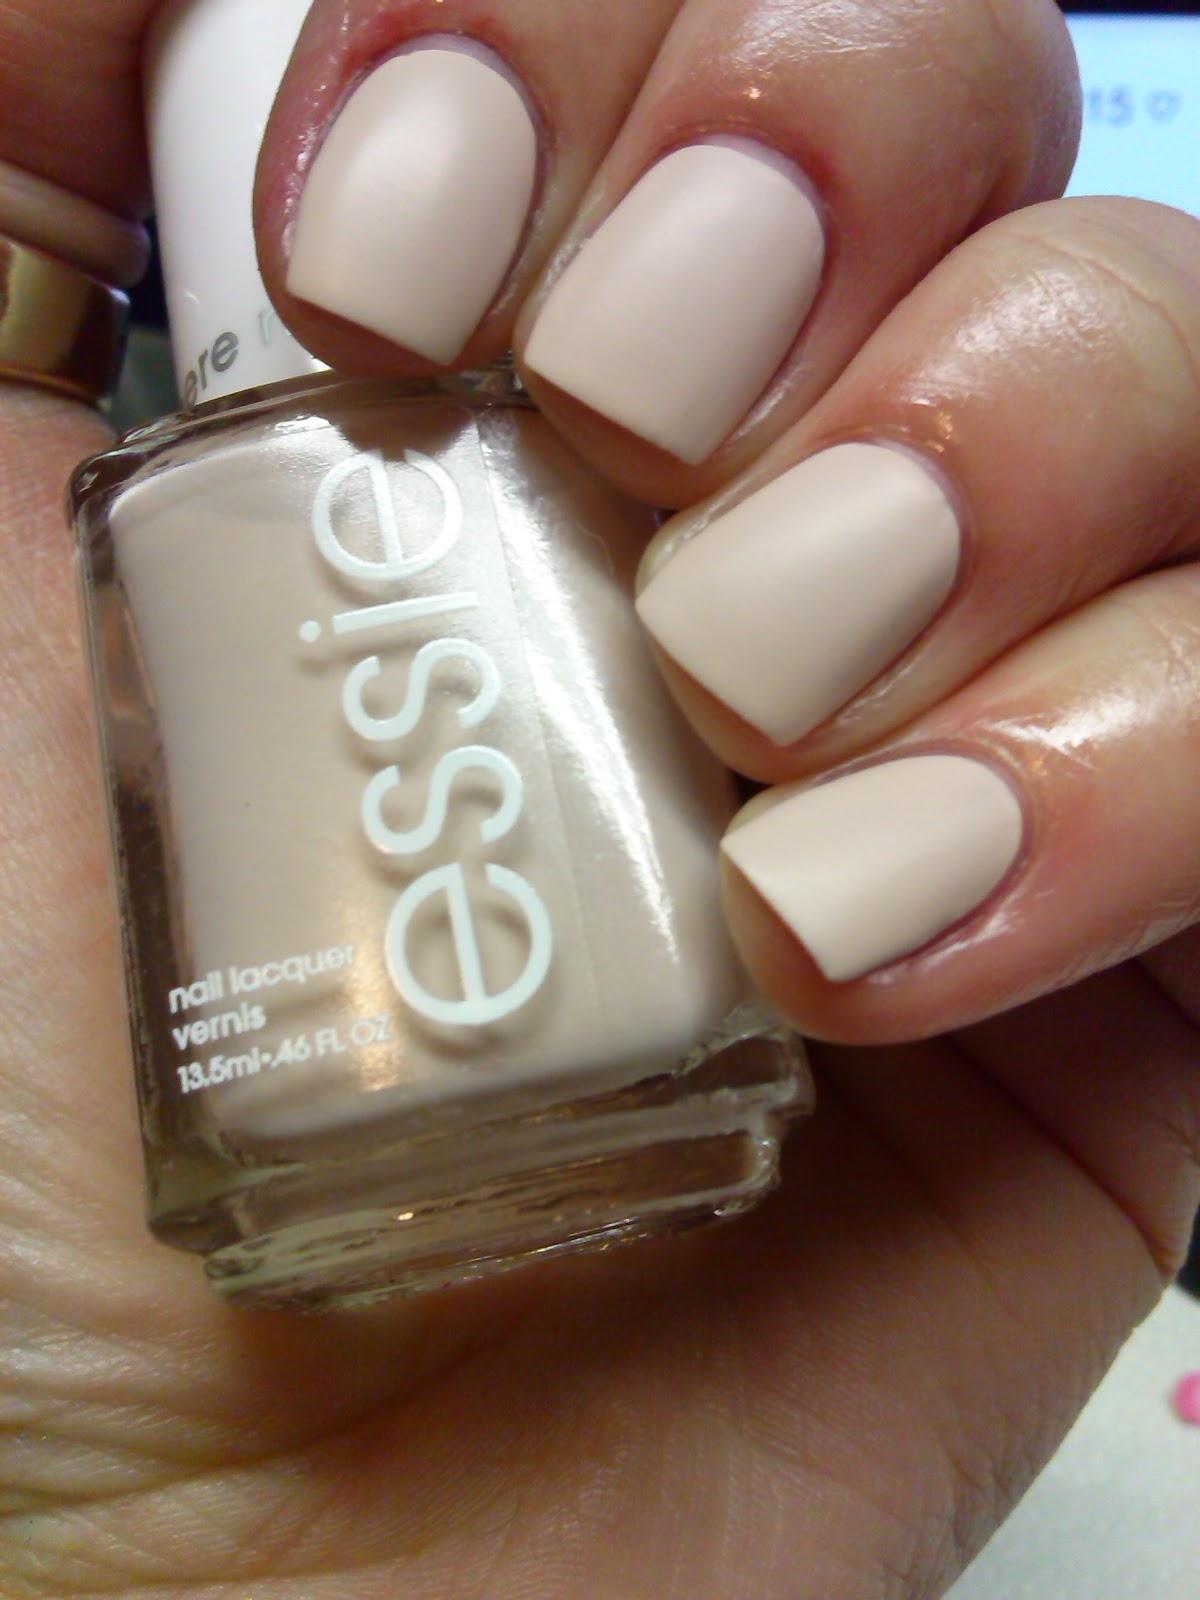 Off White Nail Polish Essie - Absolute cycle